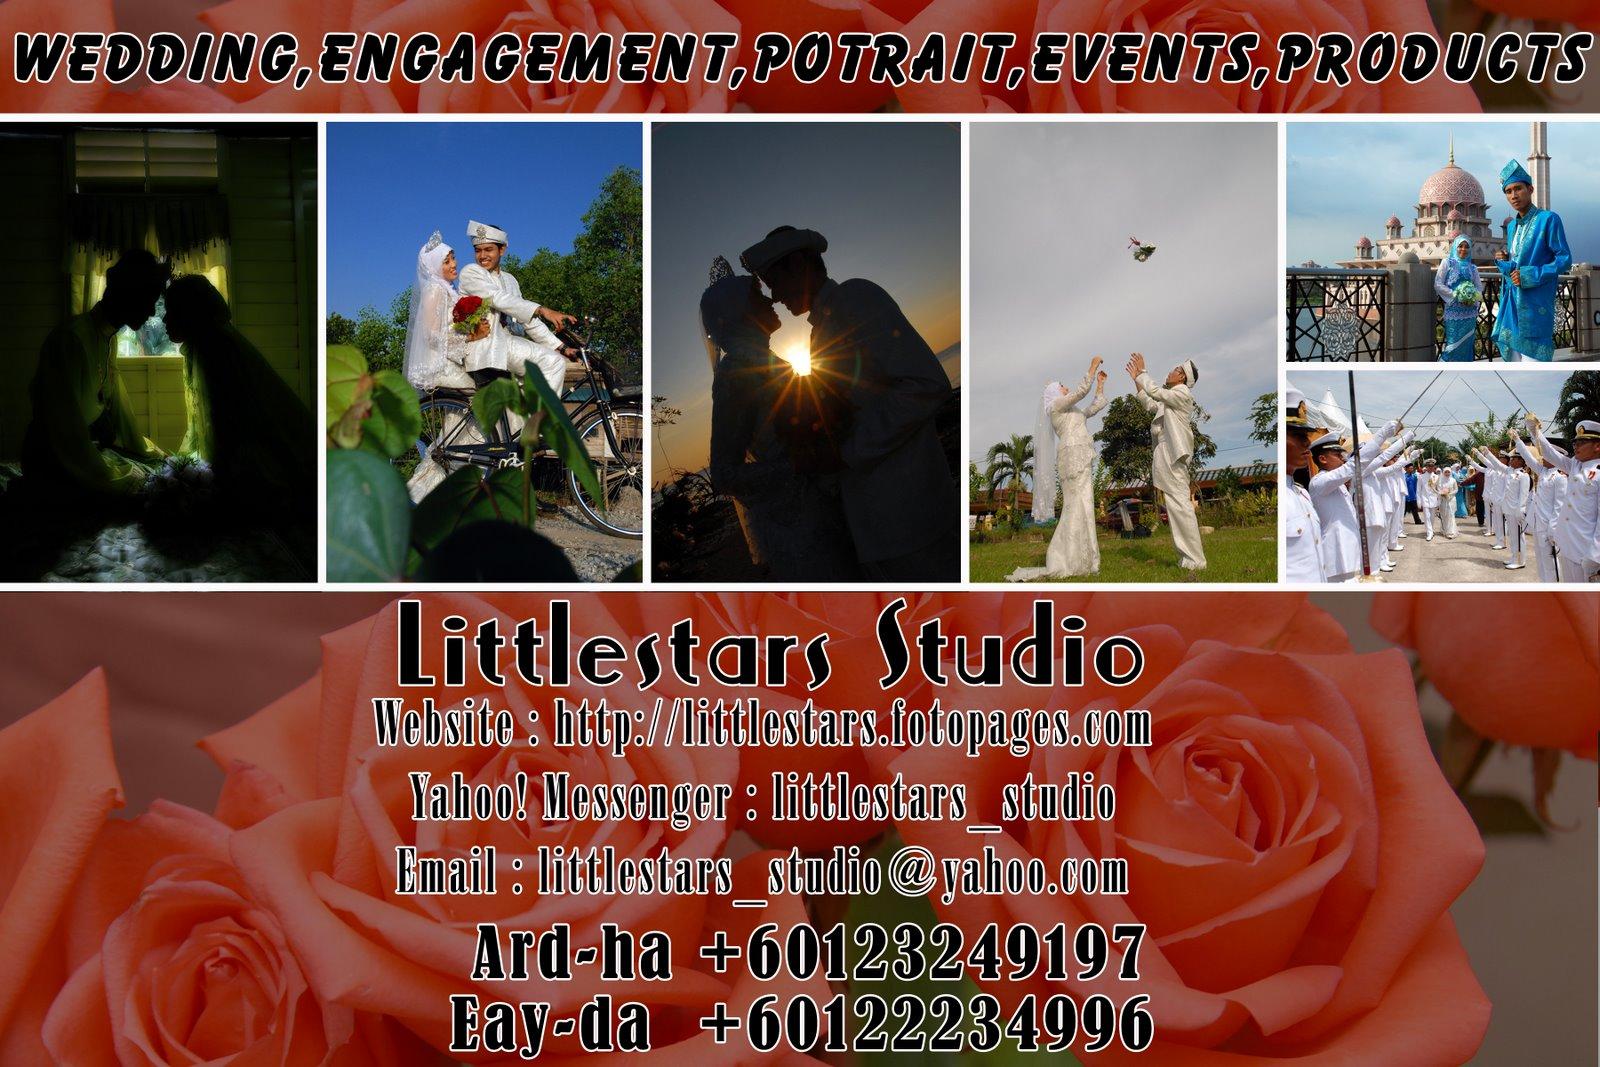 Wedding,Engagement,Portrait,Events,Products